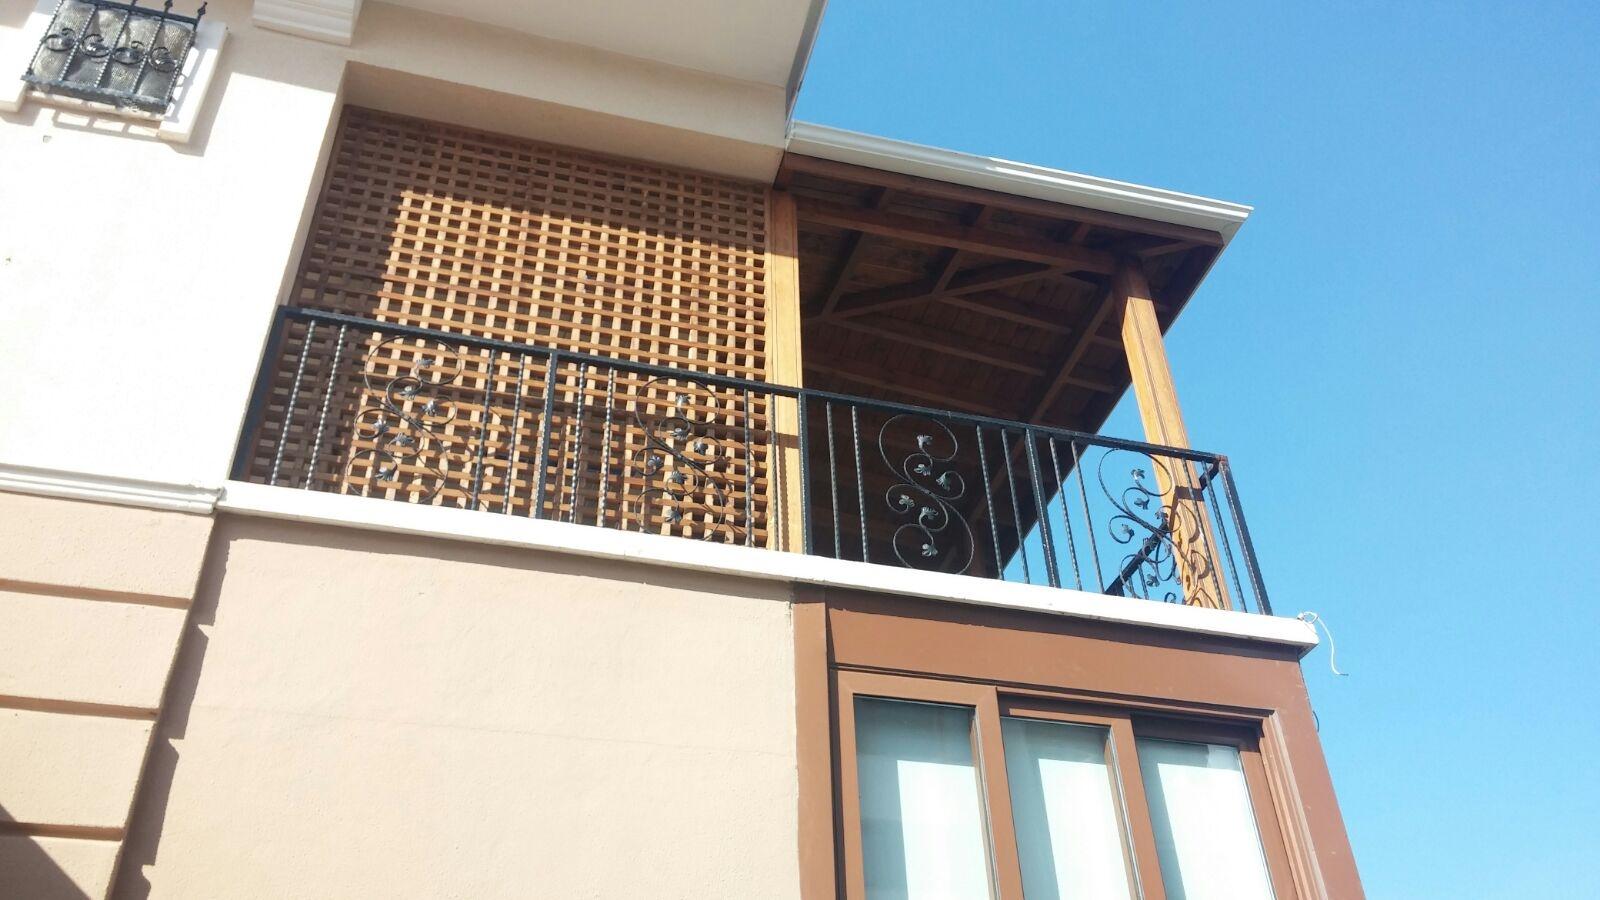 Balkon Seperatörlü Sundurma